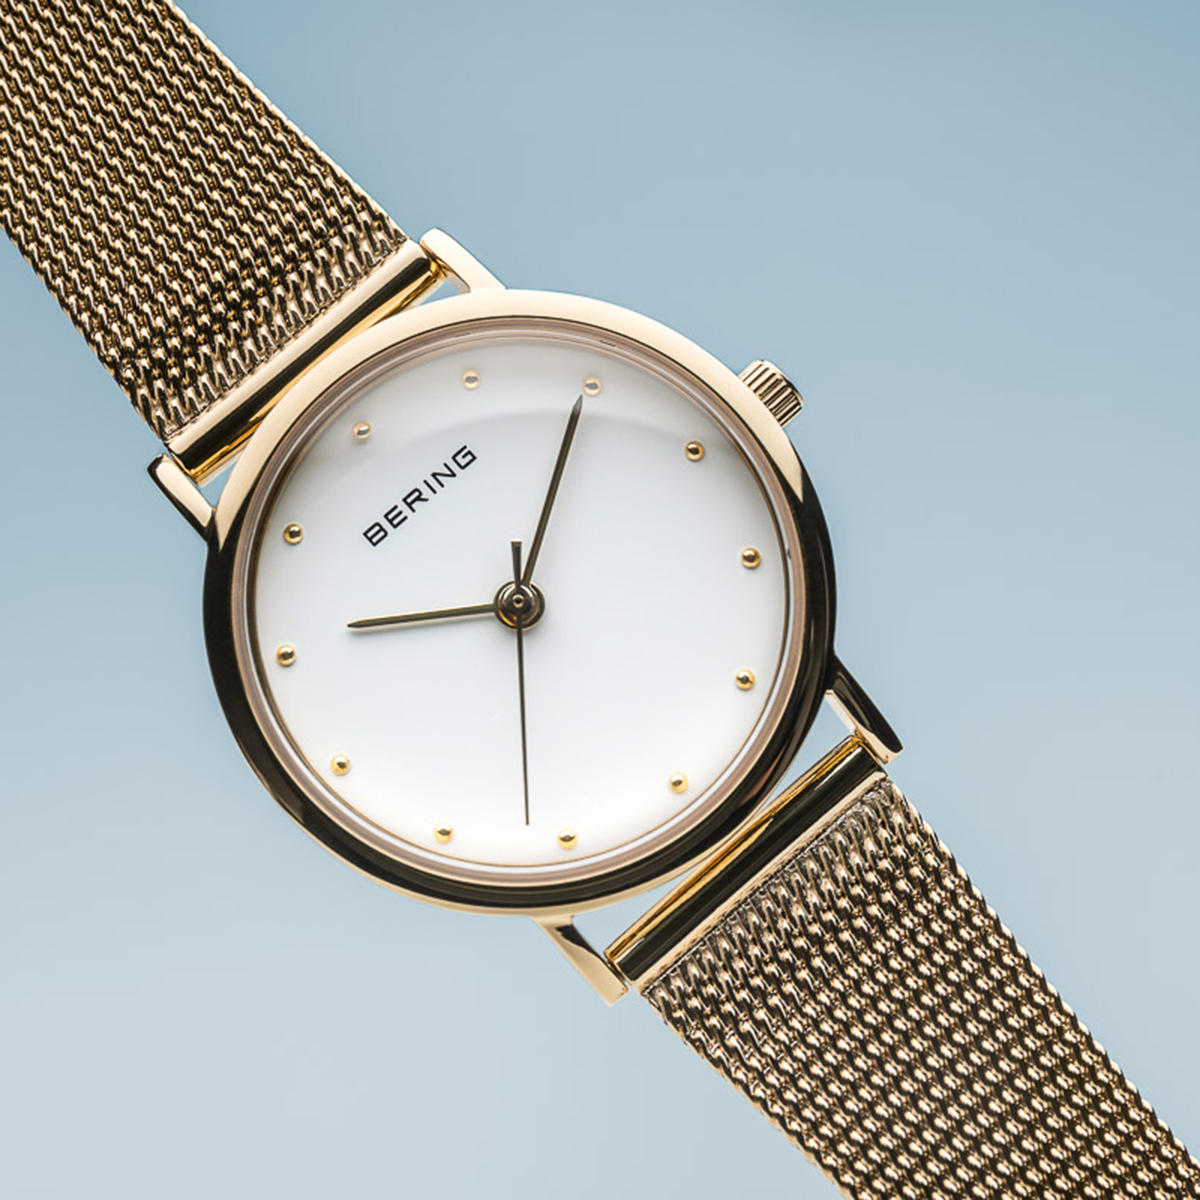 Zegarek damski Bering classic 13426-334 - duże 2